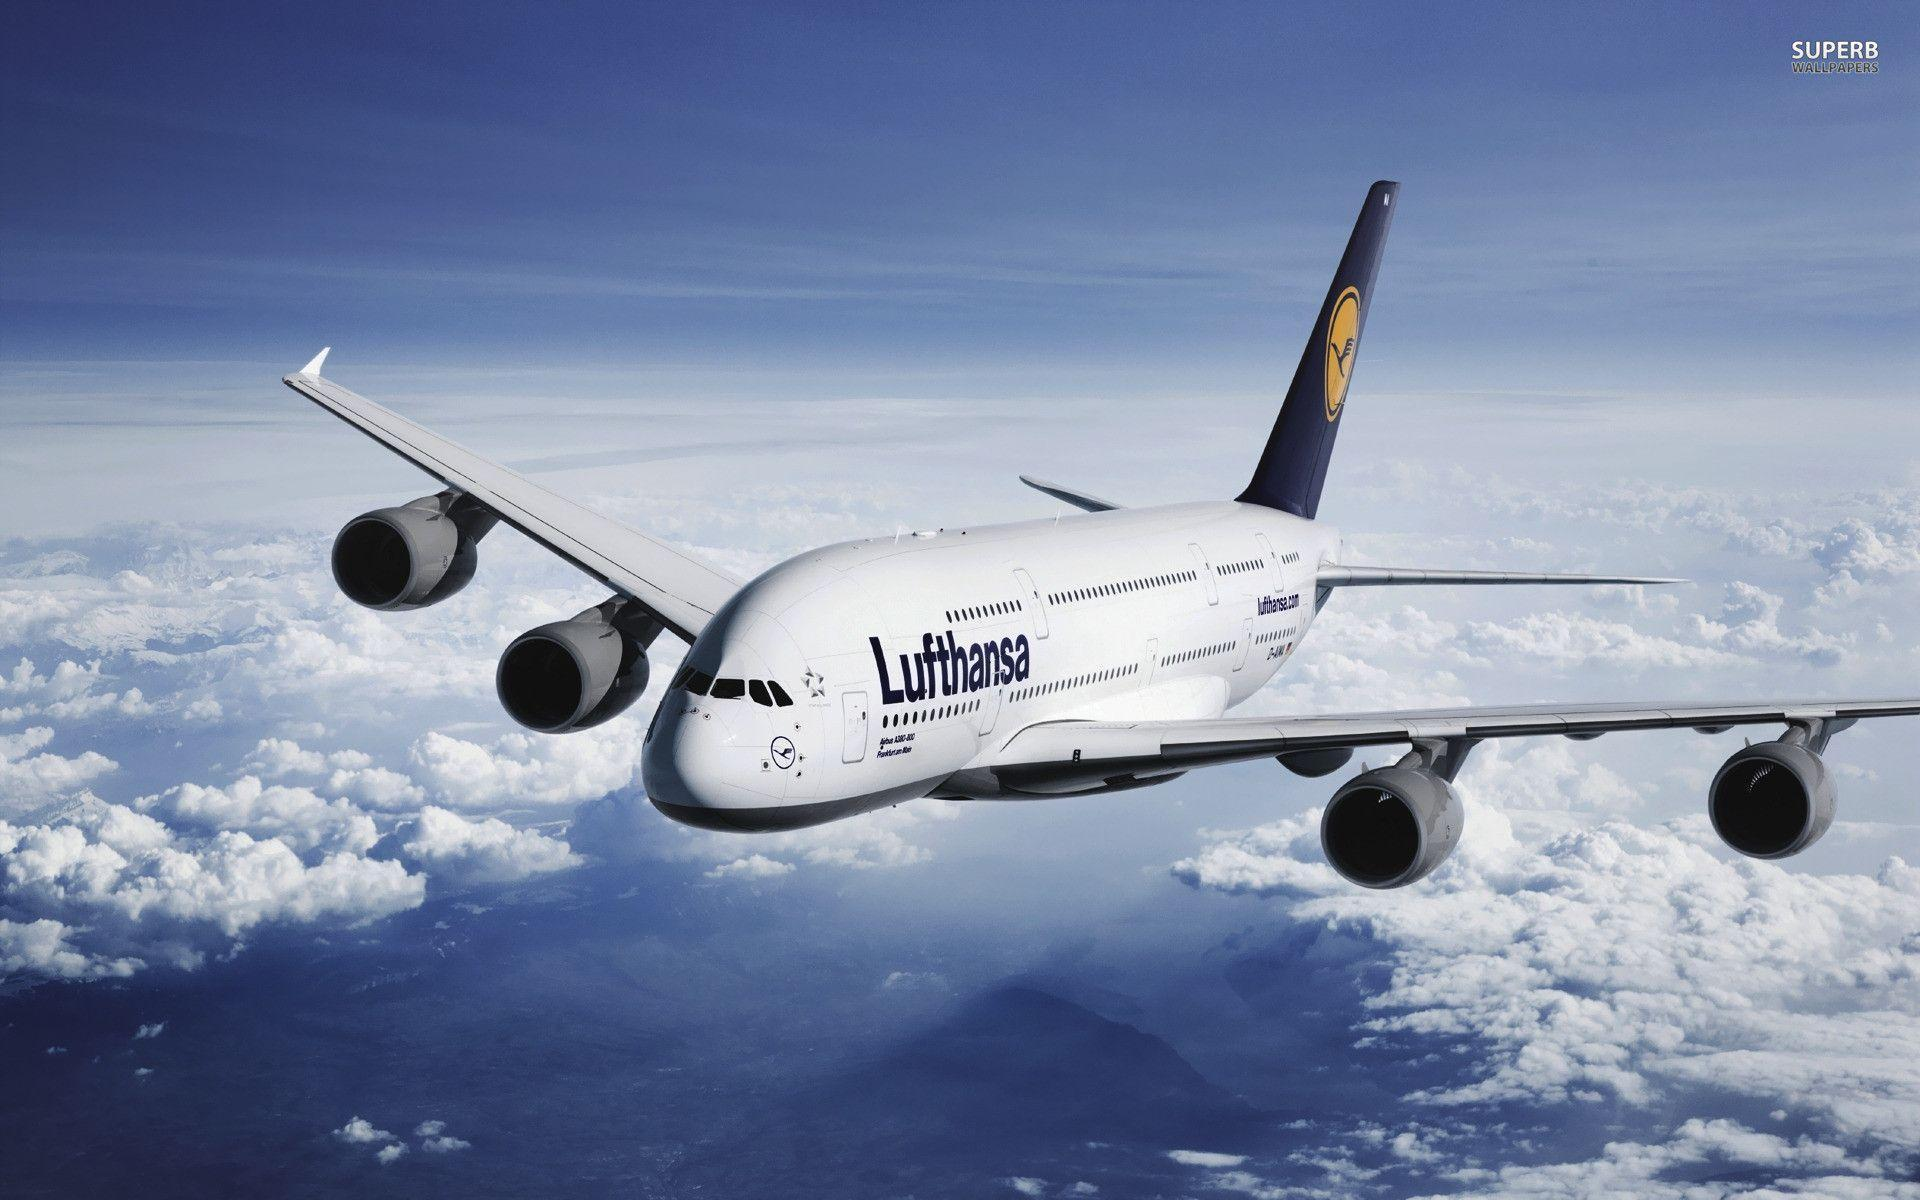 <b>Airbus A380</b> Cockpit <b>Wallpaper</b> - WallpaperSafari